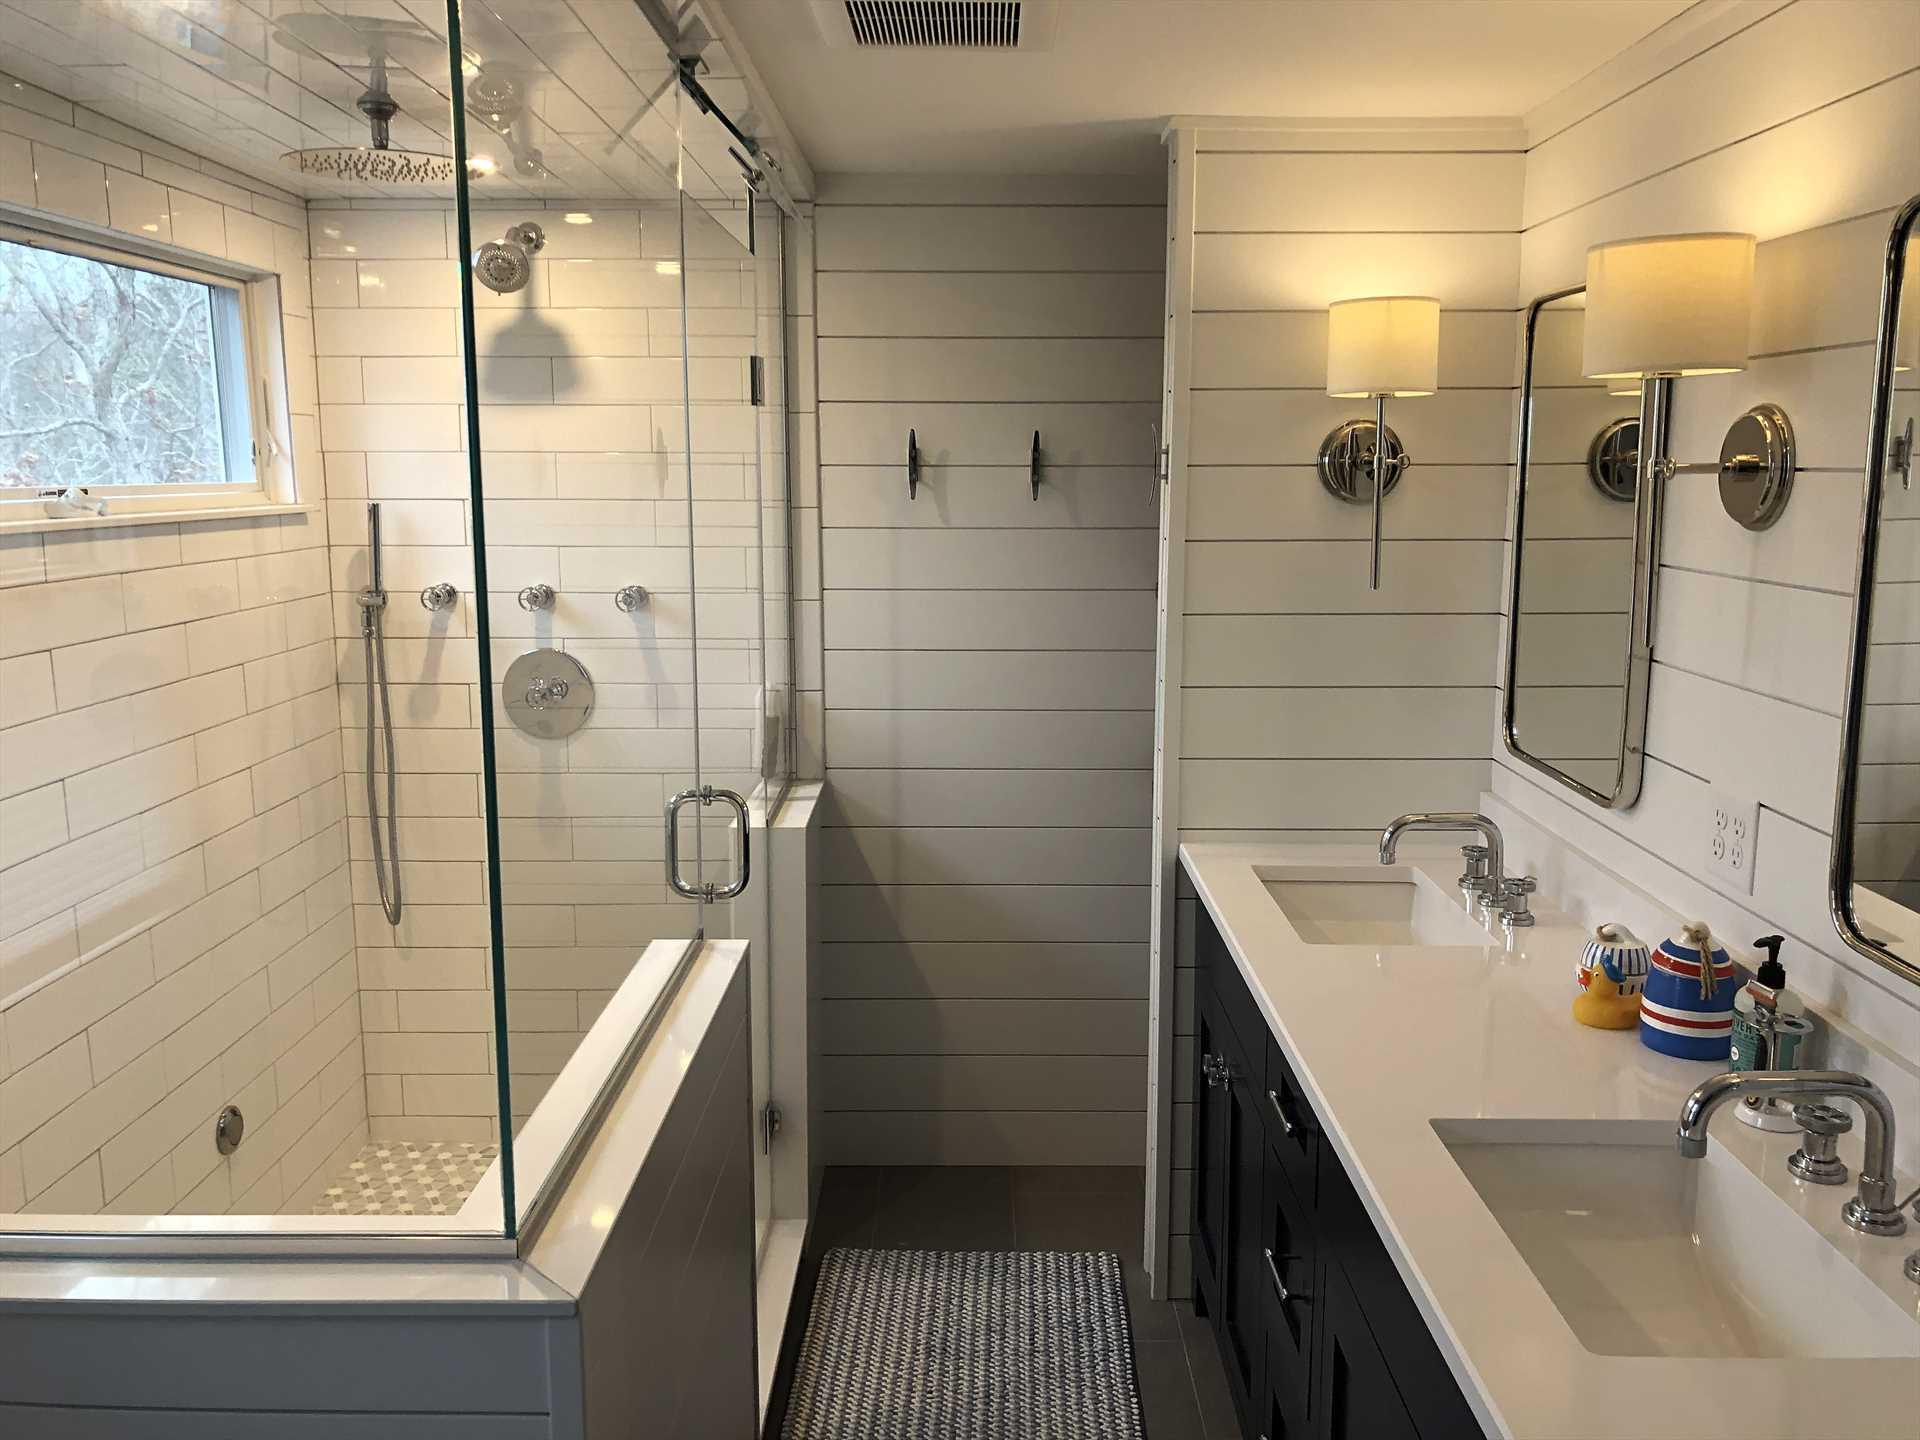 Bathroom with Shower - 2nd Floor